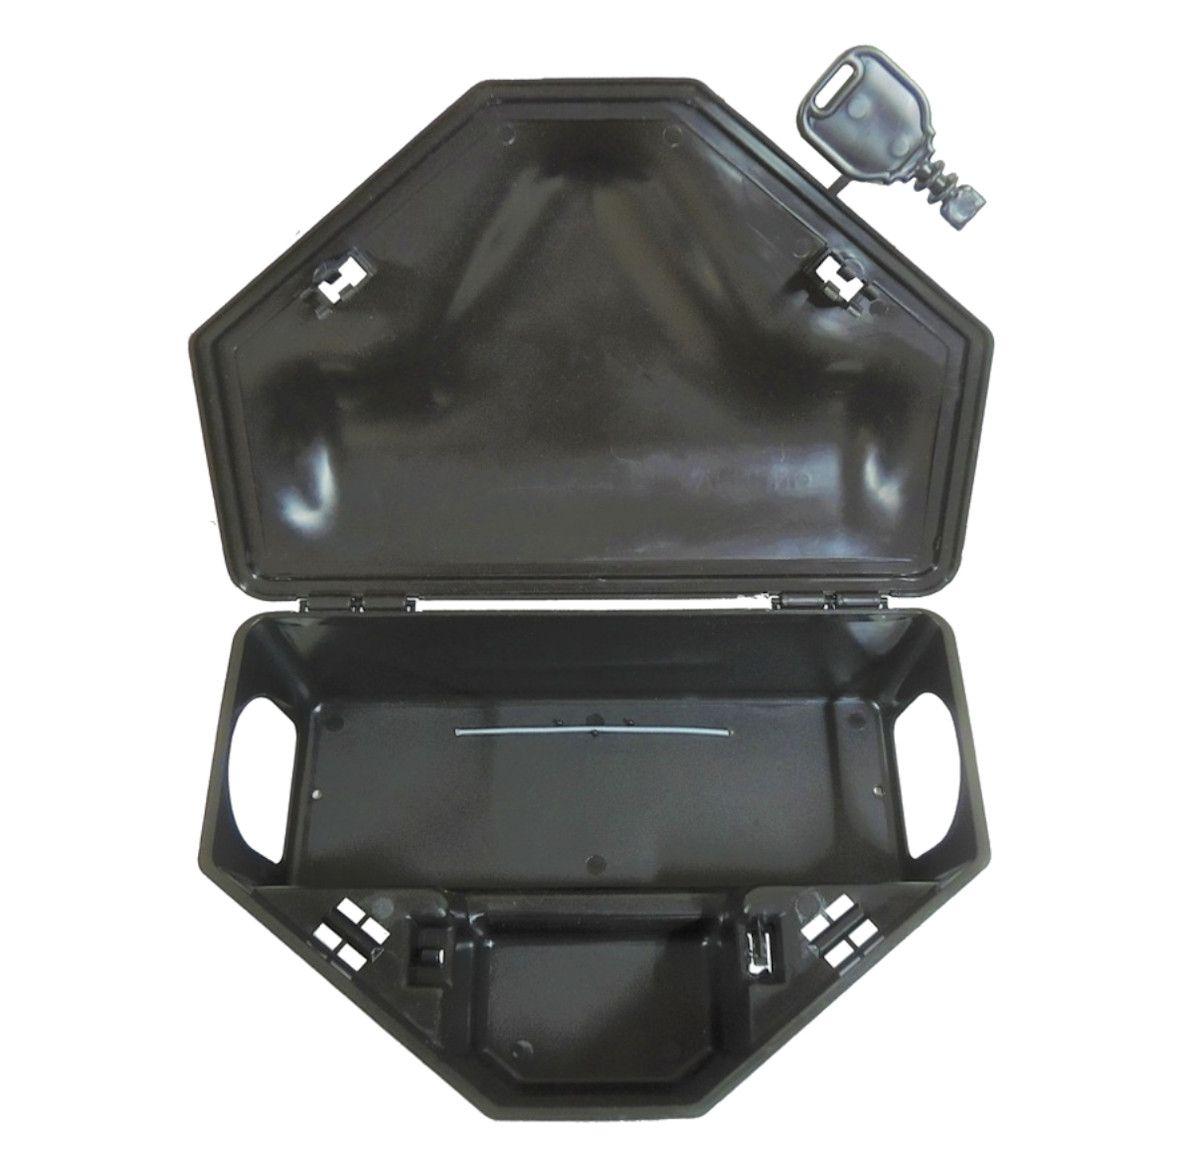 Kit 14 Porta Isca Com 2 Chaves - Duplo Travamento